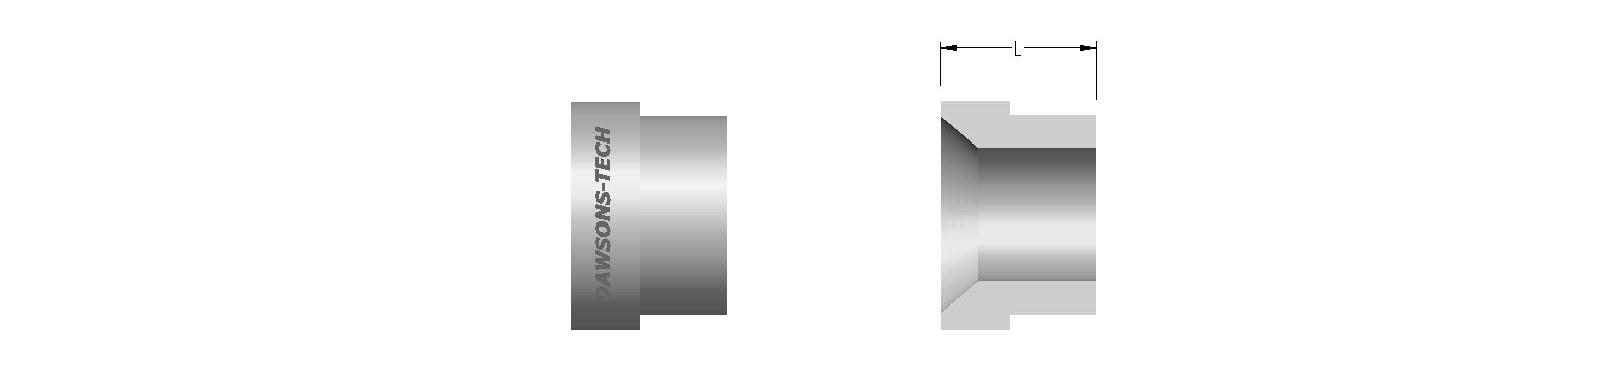 04 Flare Tube End Sleeve